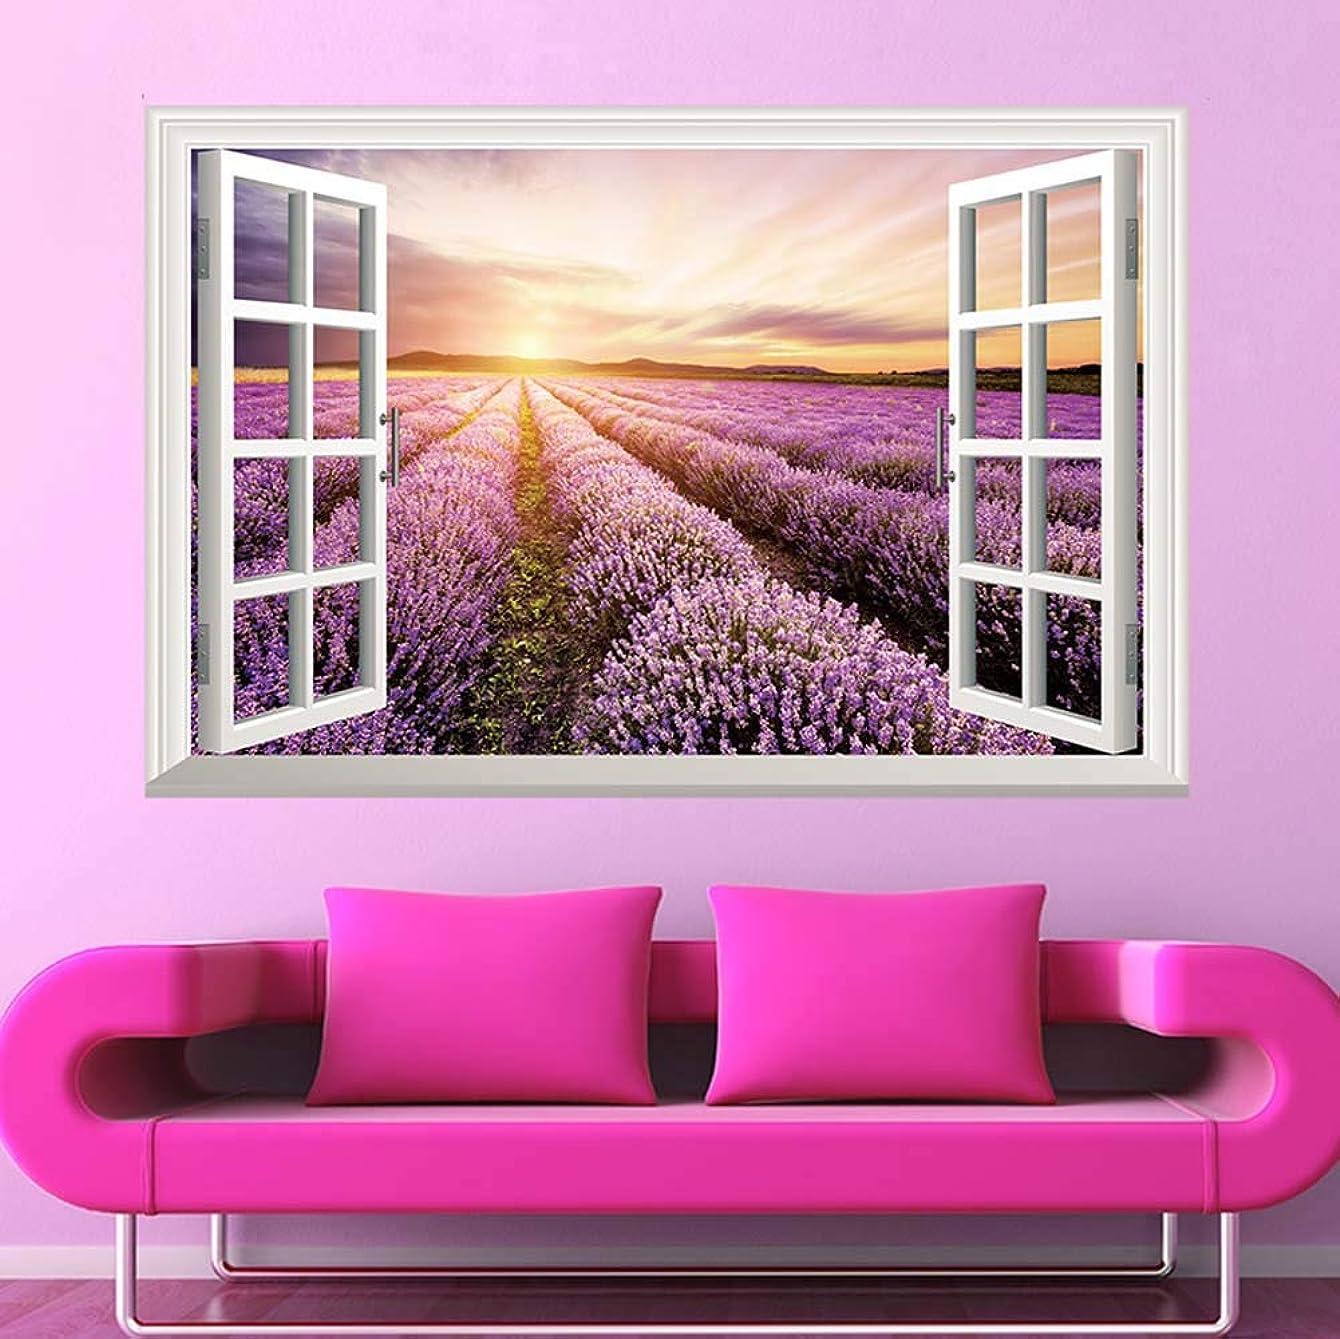 iwallsticker 3D Fake Window Wall Decal Lavender Vinyl Wall Sticker Art Home Décor Removable Wall Mural Poster Stickers